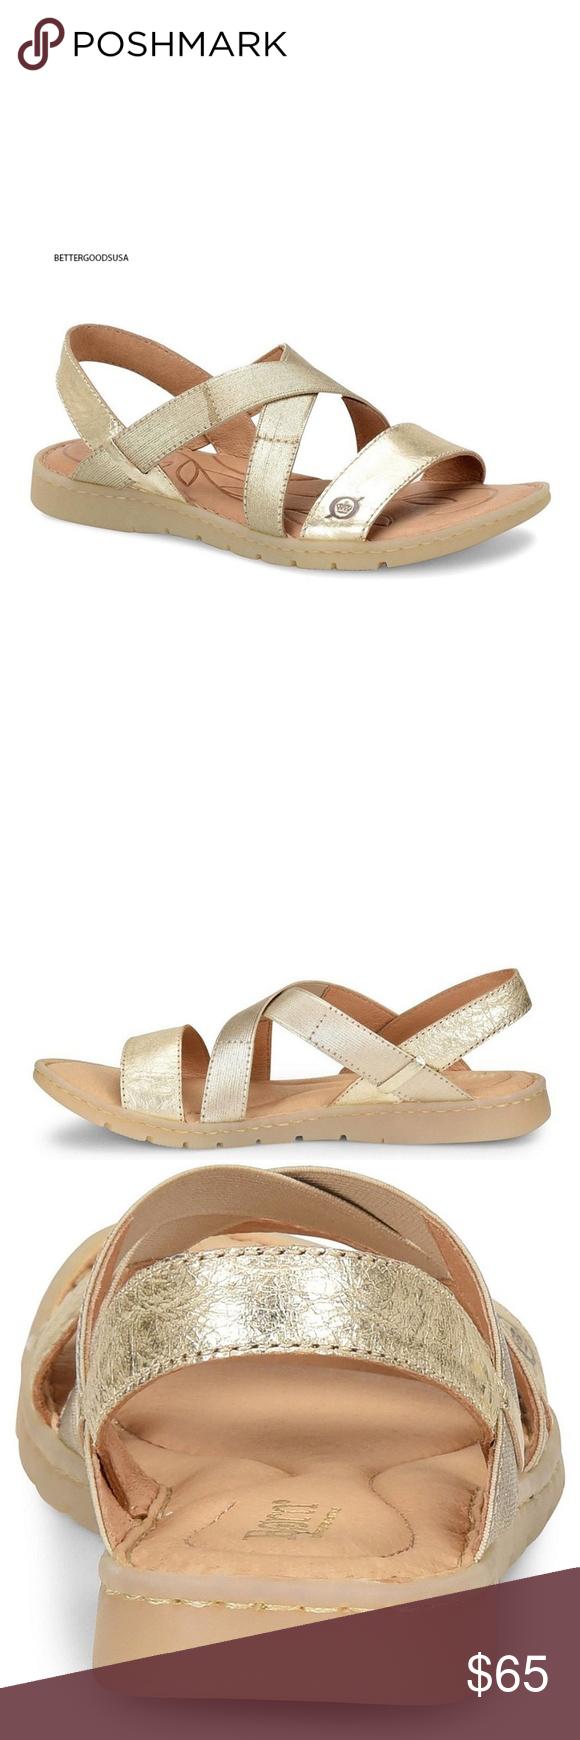 47e6617ad1474 Born Atiana Slingback Leather Sandals Gold 9 M SIZE  US 9 M Condition  BRAND